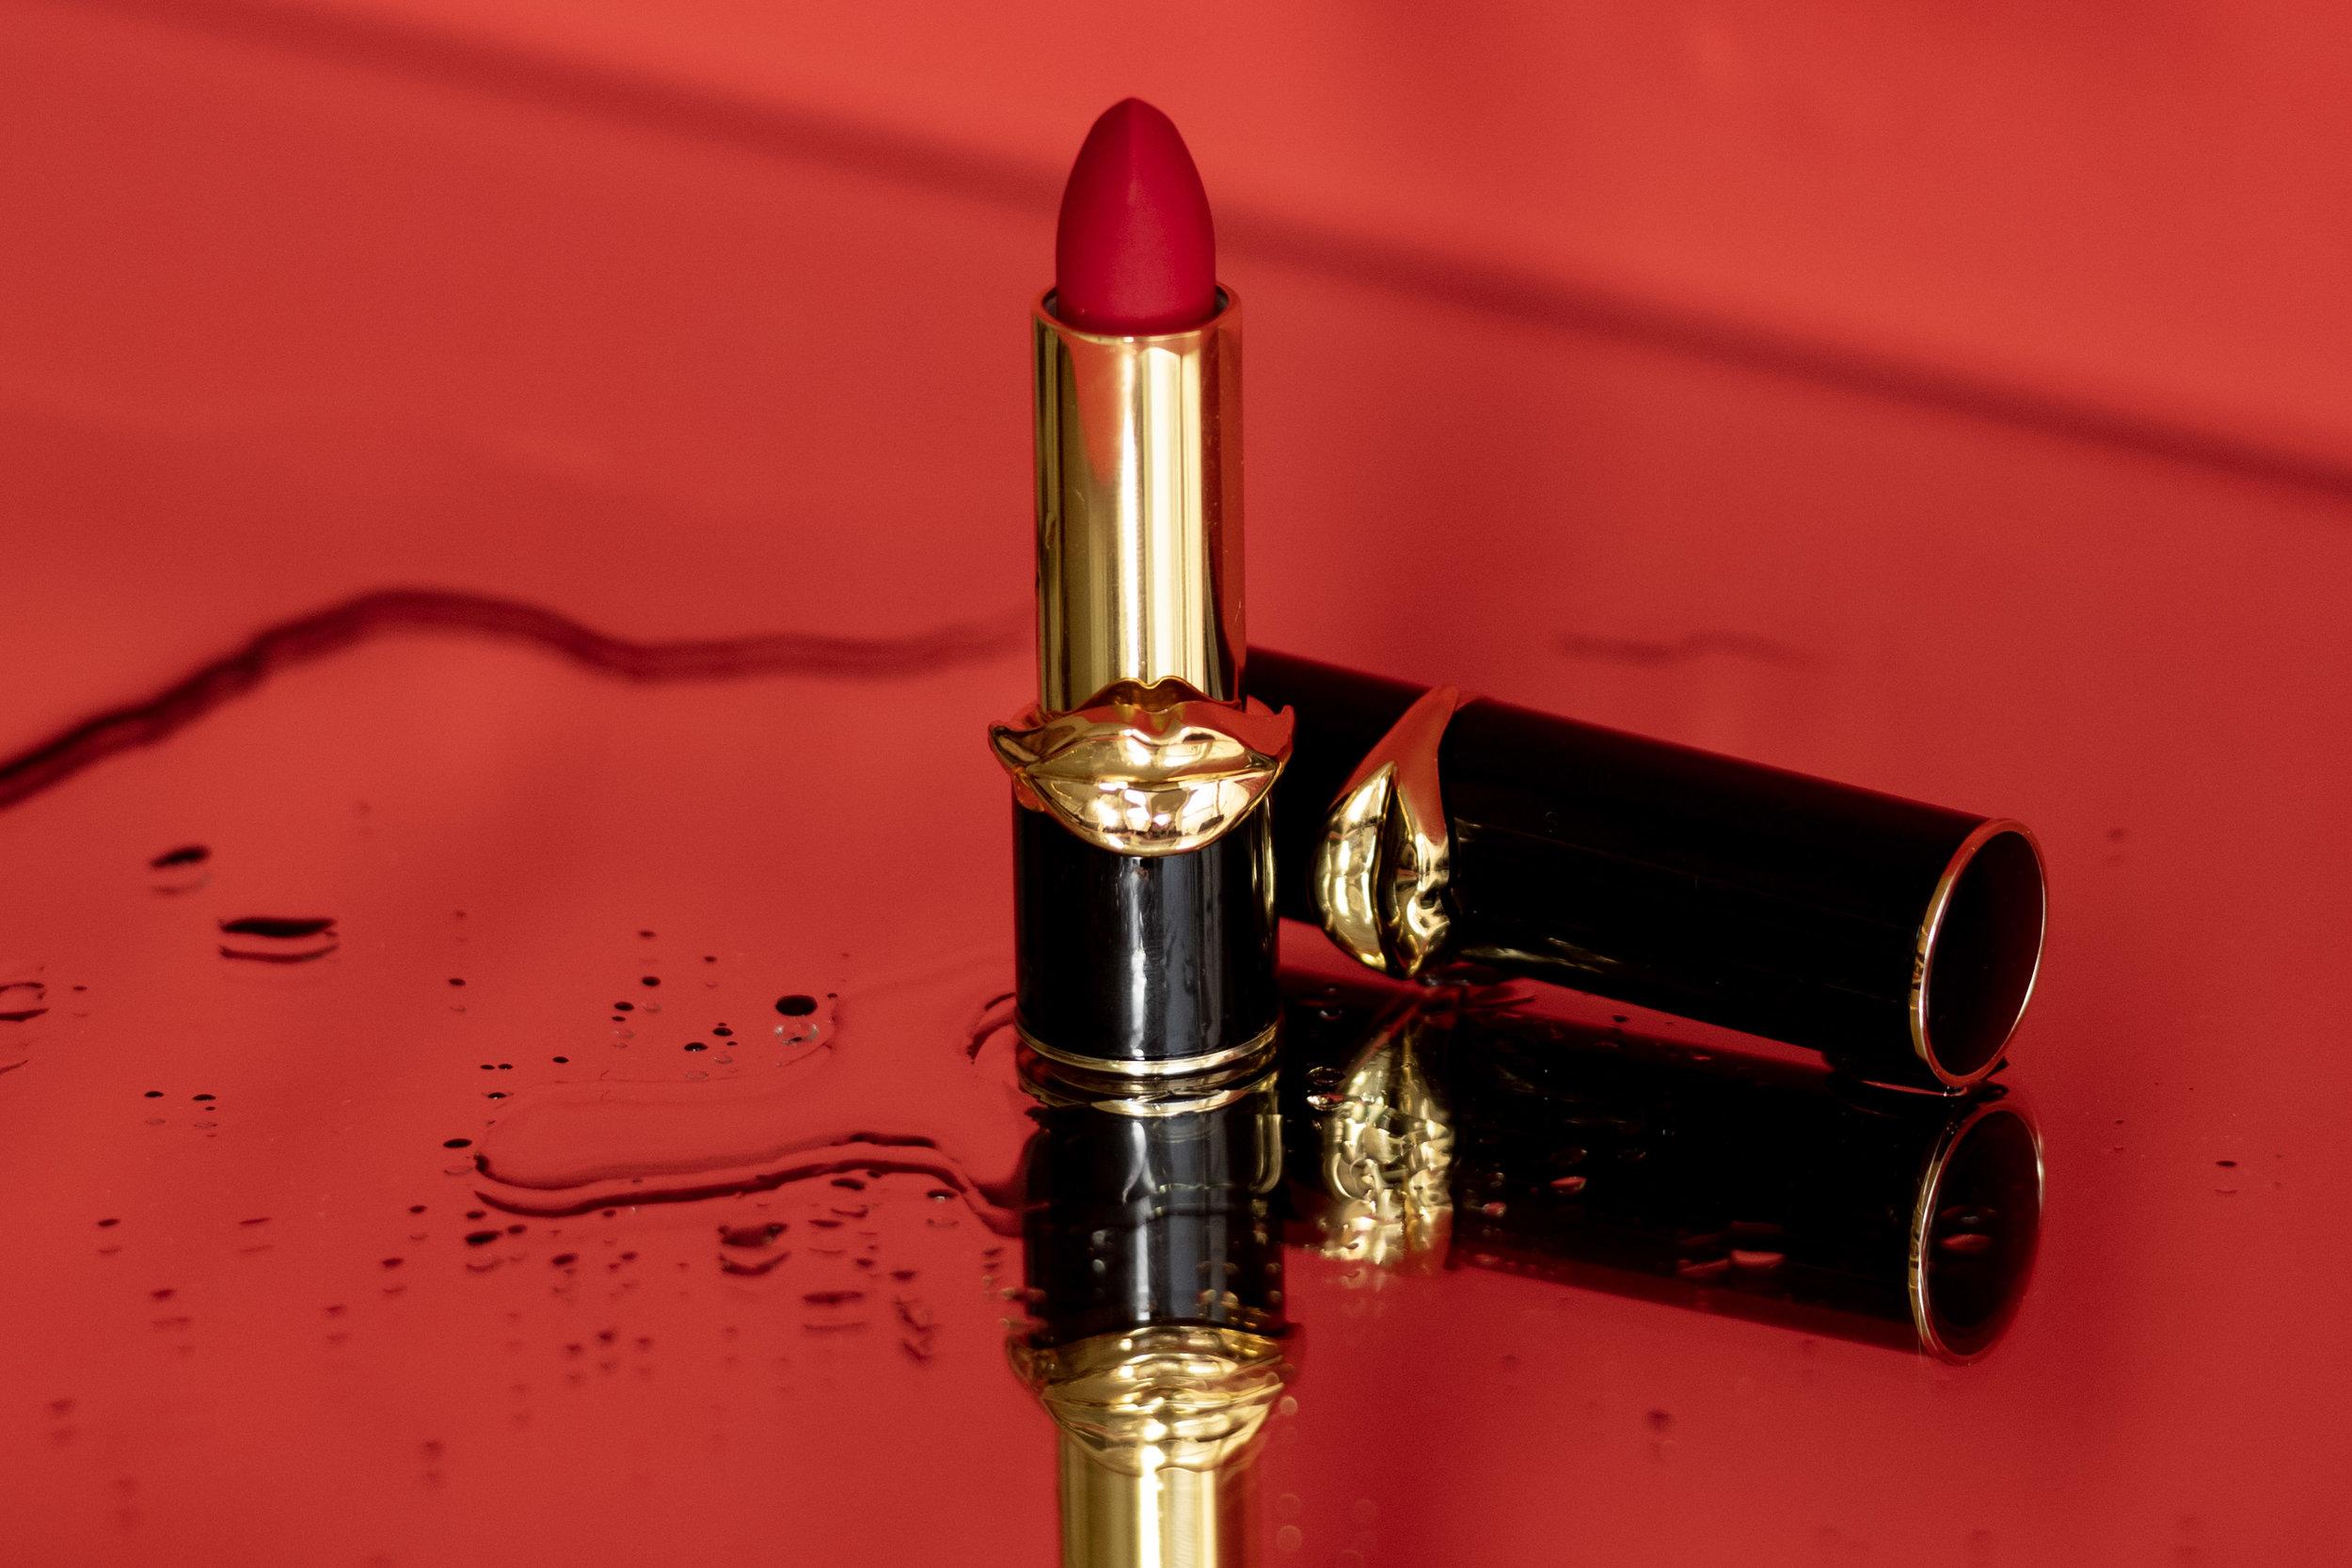 Fiona-Tan-Image-JVB-PatMcGrath-Lipsticks.jpg